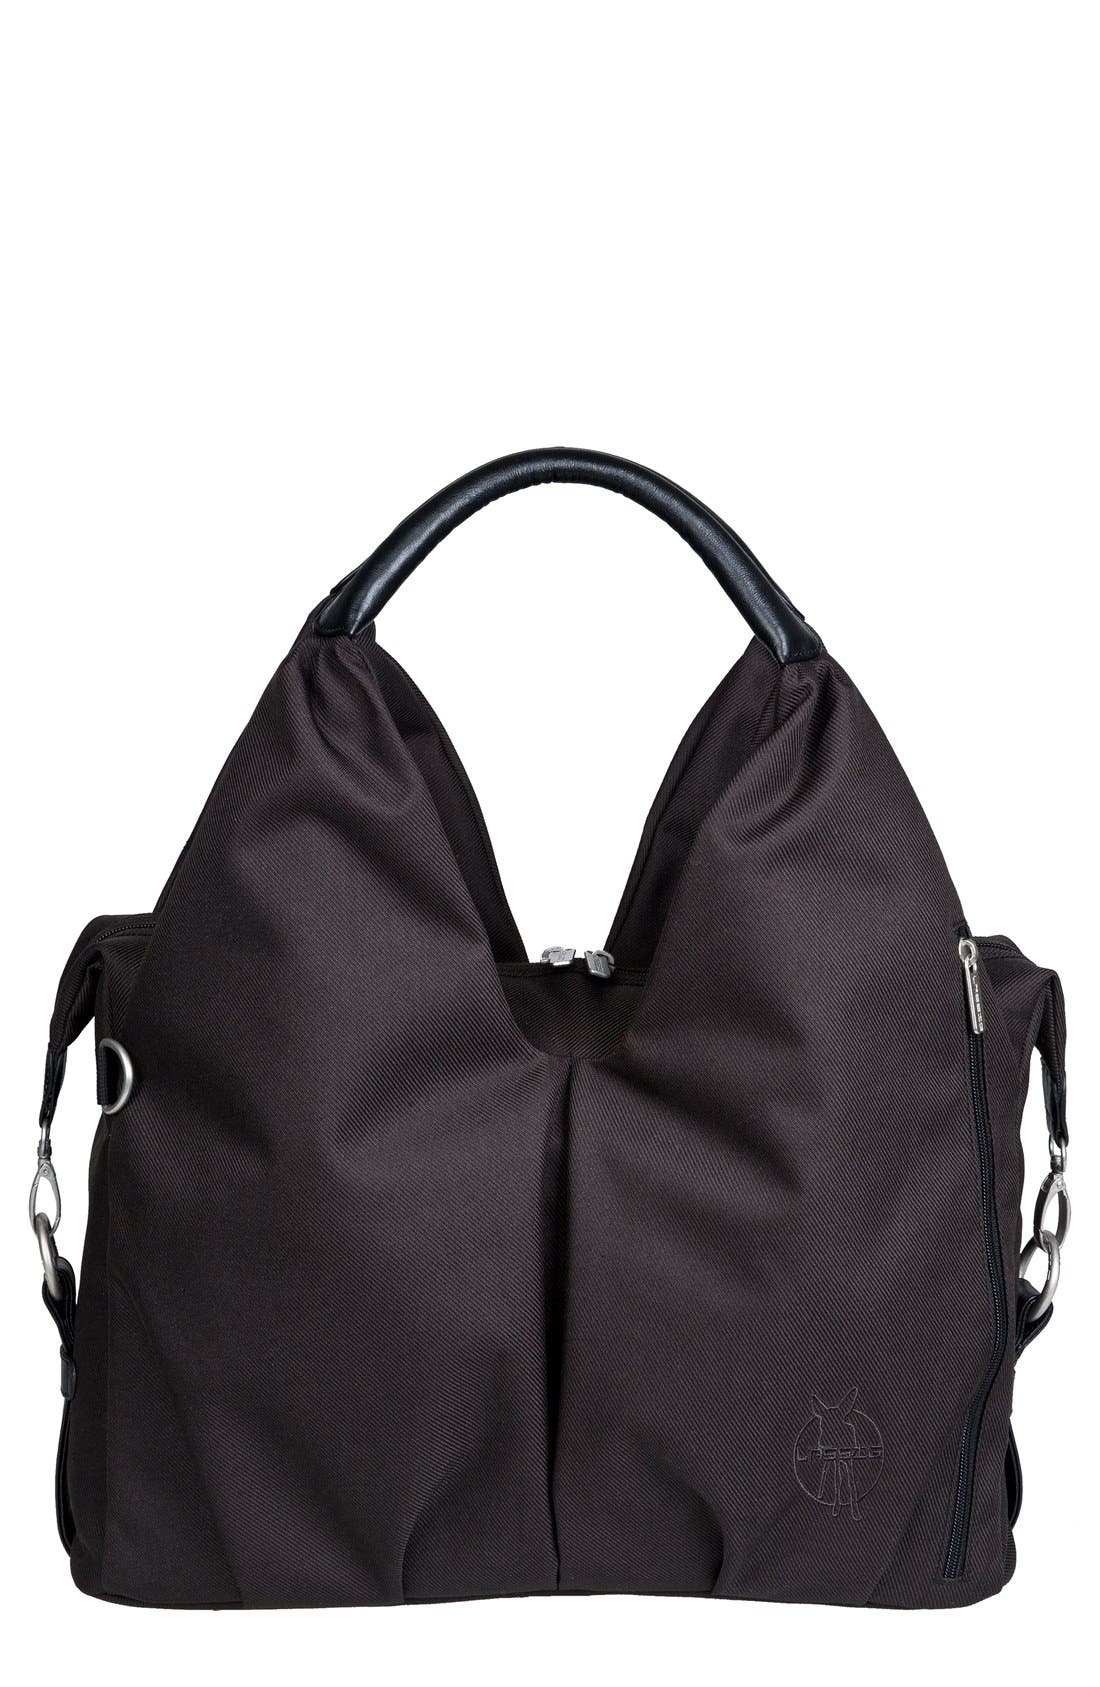 'Green Label - Neckline' Diaper Bag,                             Main thumbnail 1, color,                             Black